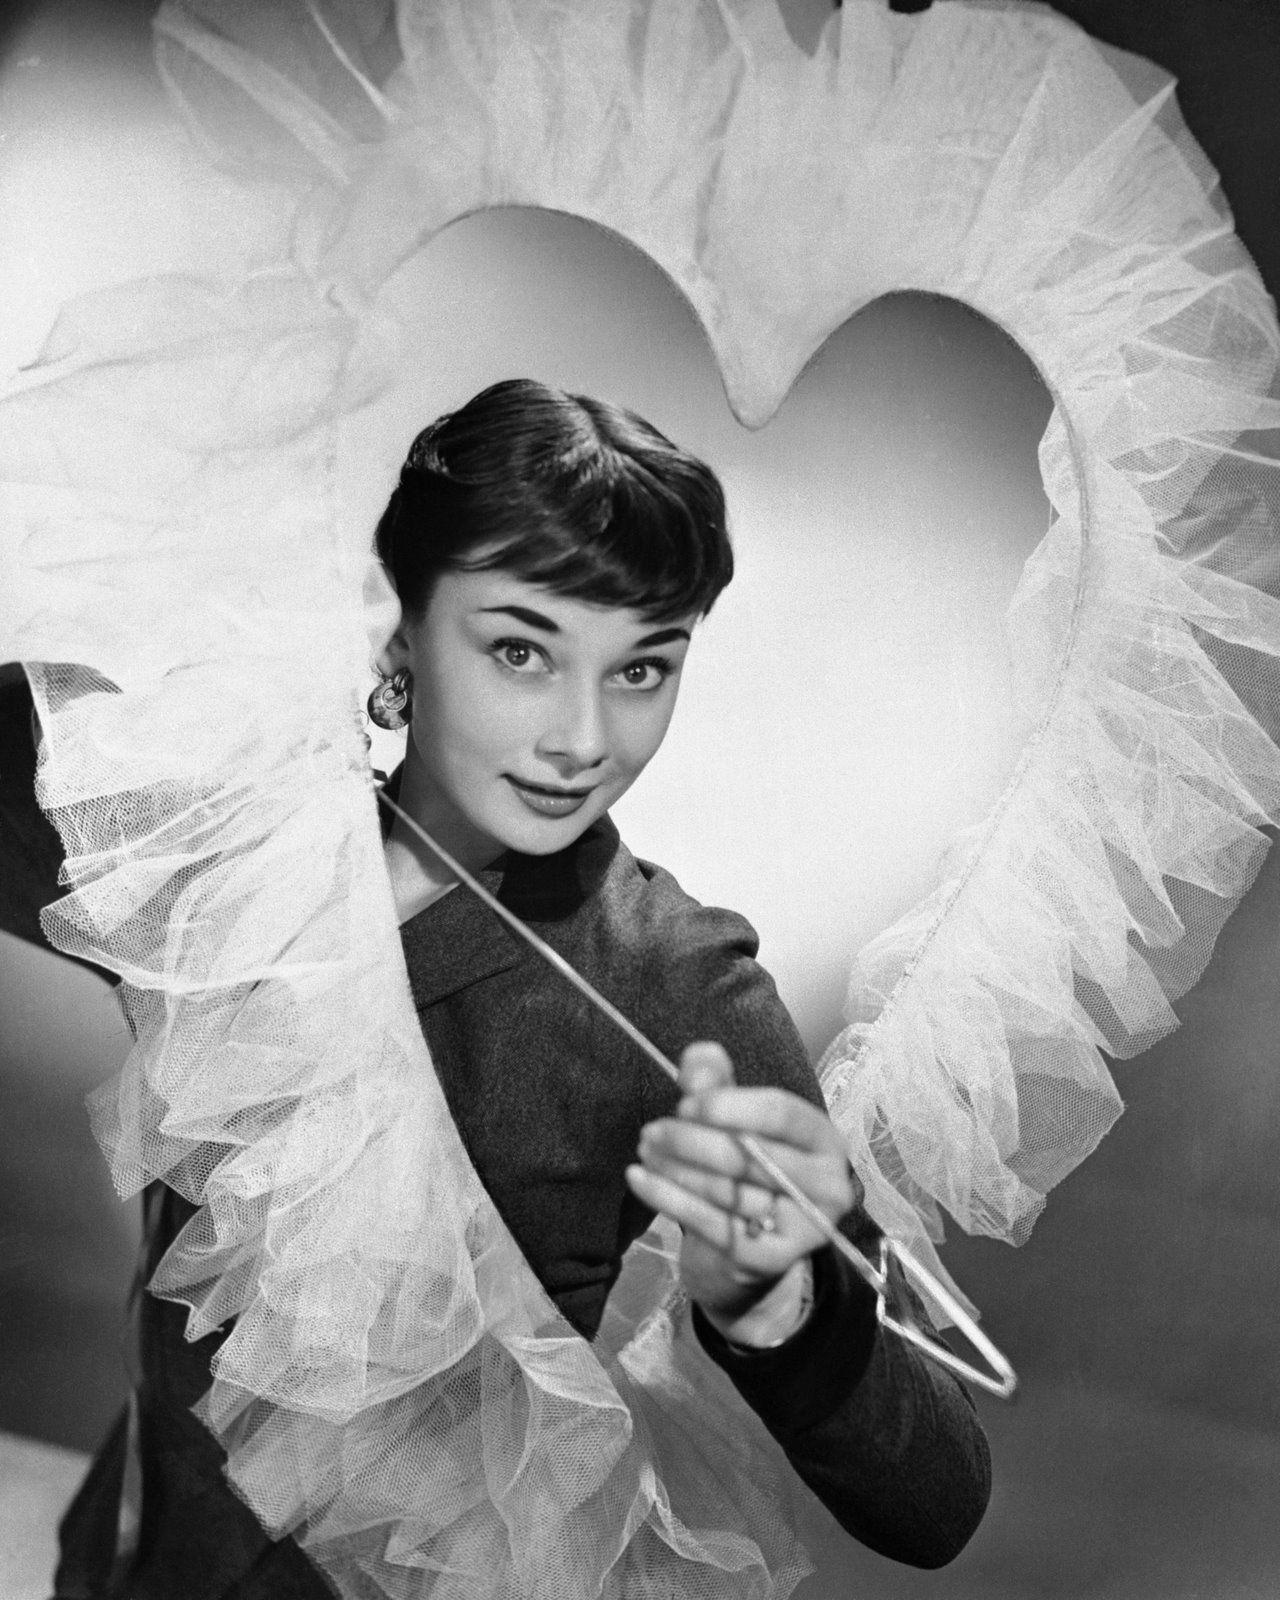 Valentine Hollywood Audrey | Audrey hepburn, Hepburn, Audrey hepburn born